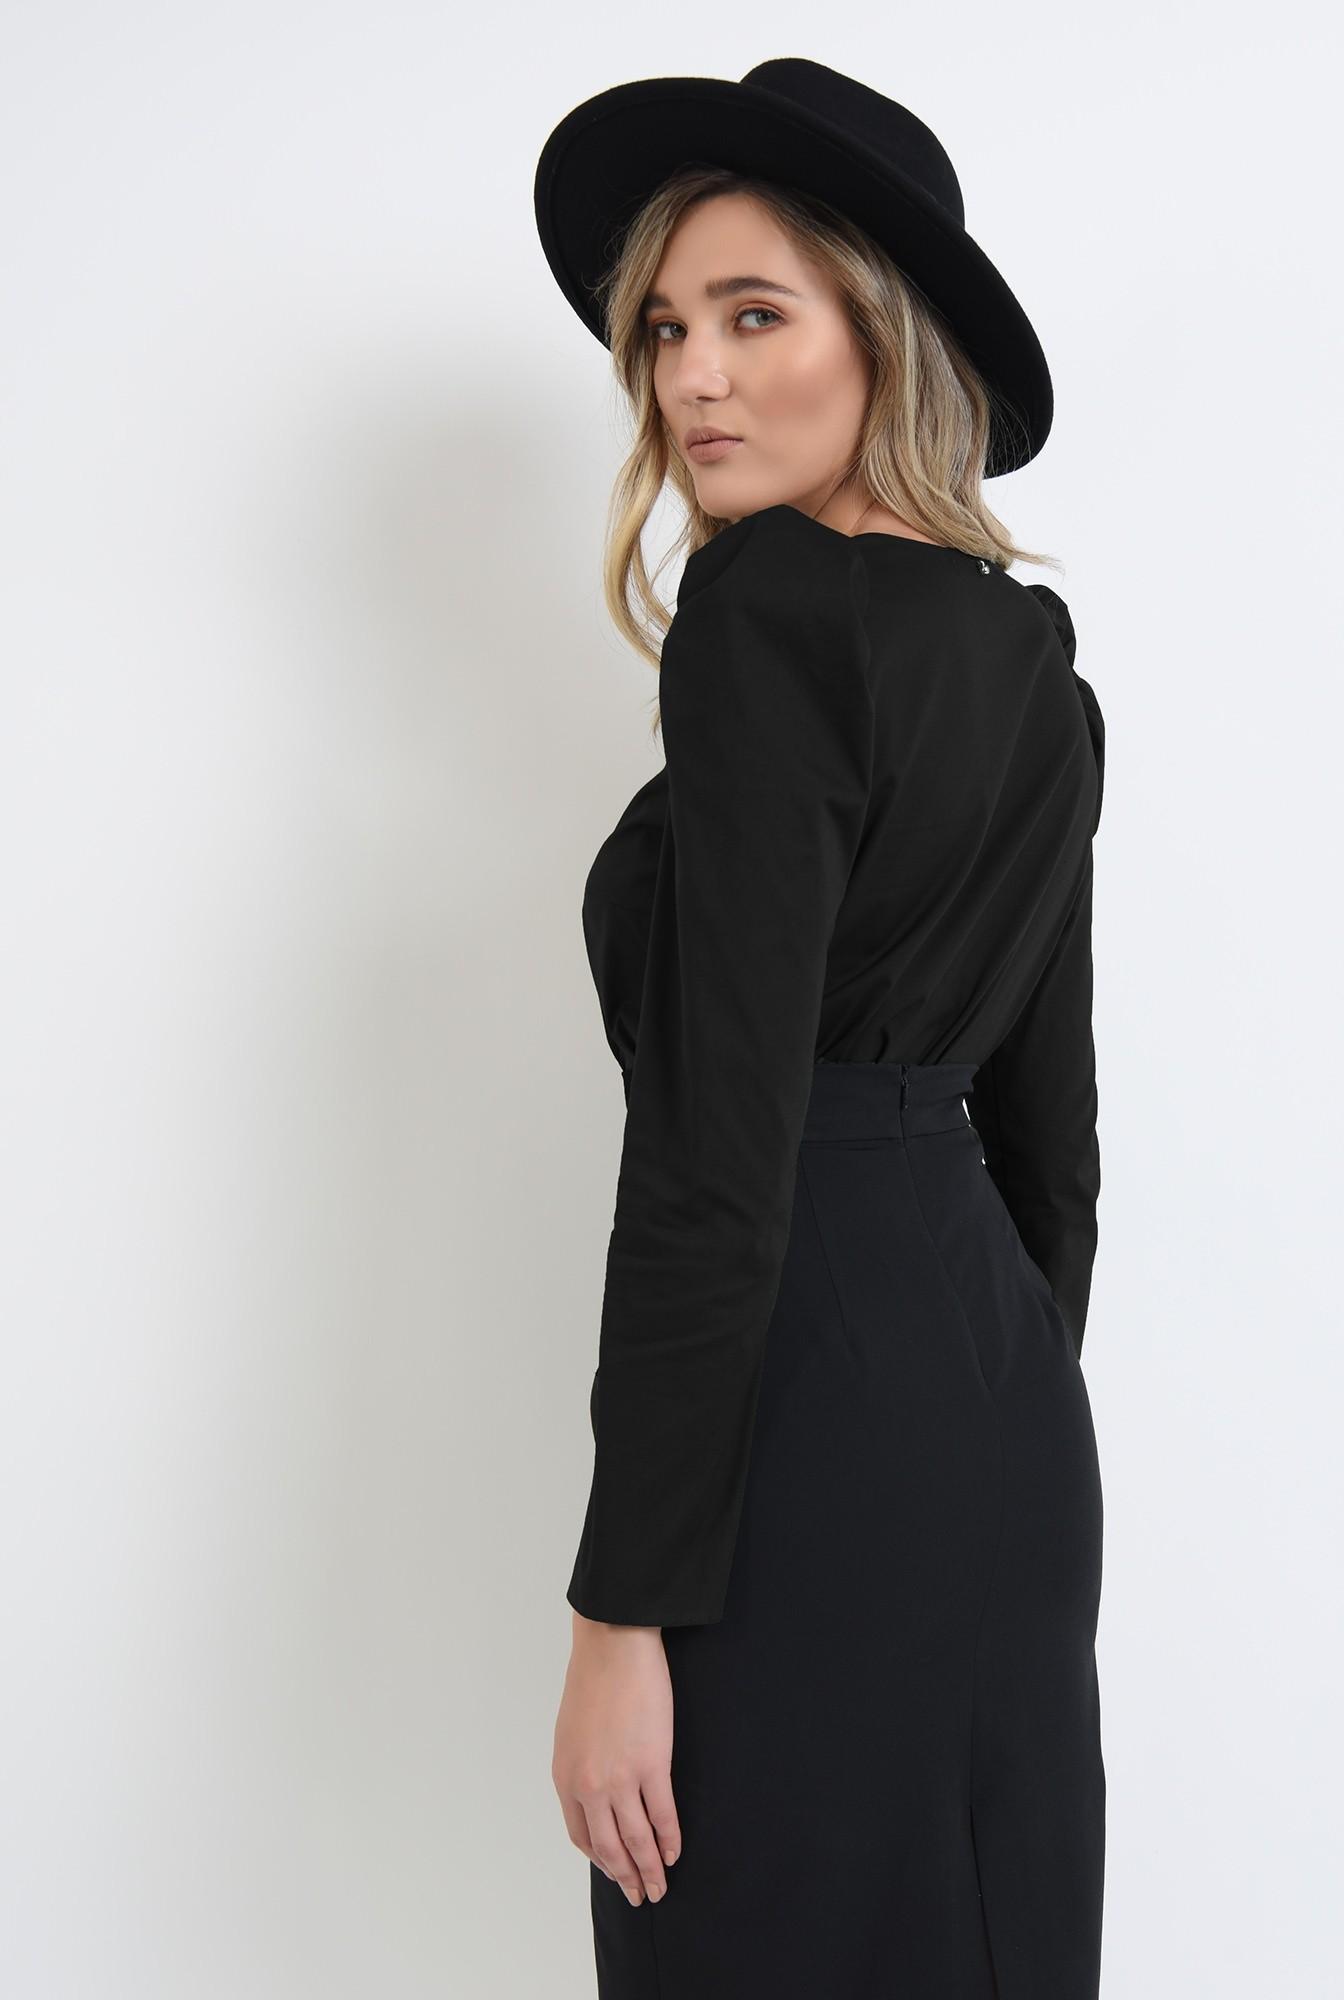 1 - bluza neagra, cu umeri accentuati, cu maneca lunga